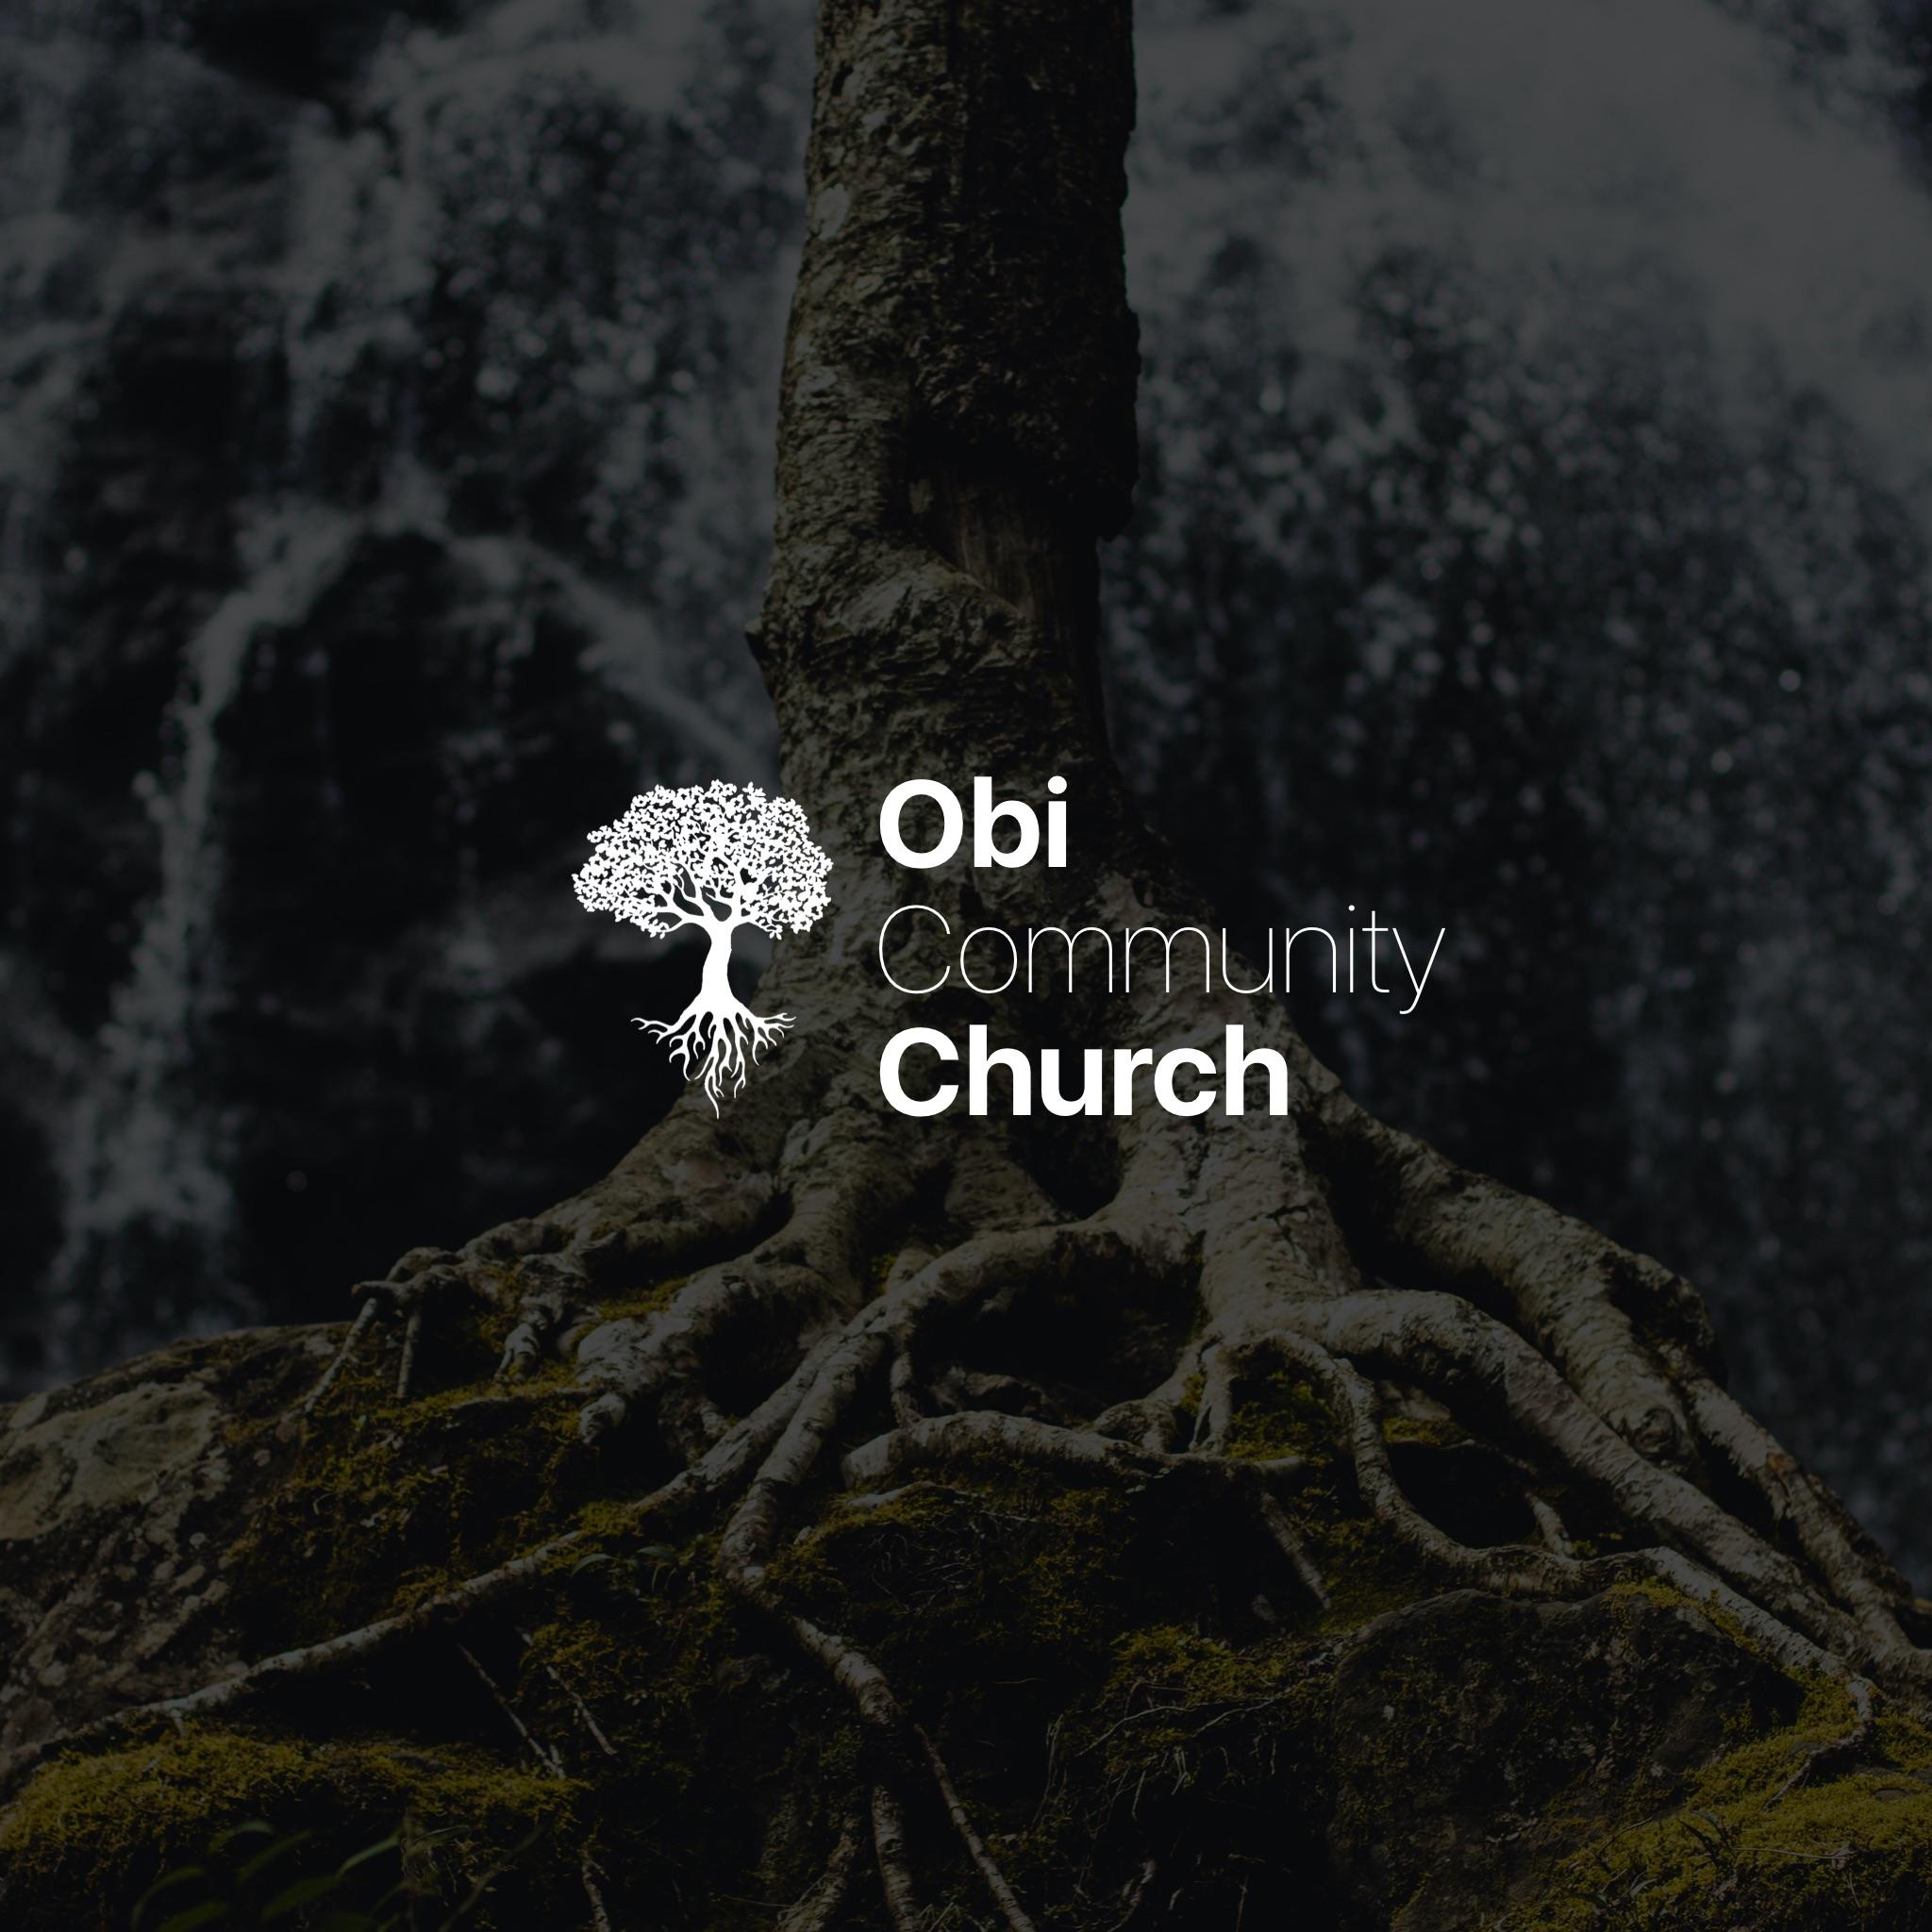 Obi Community Church